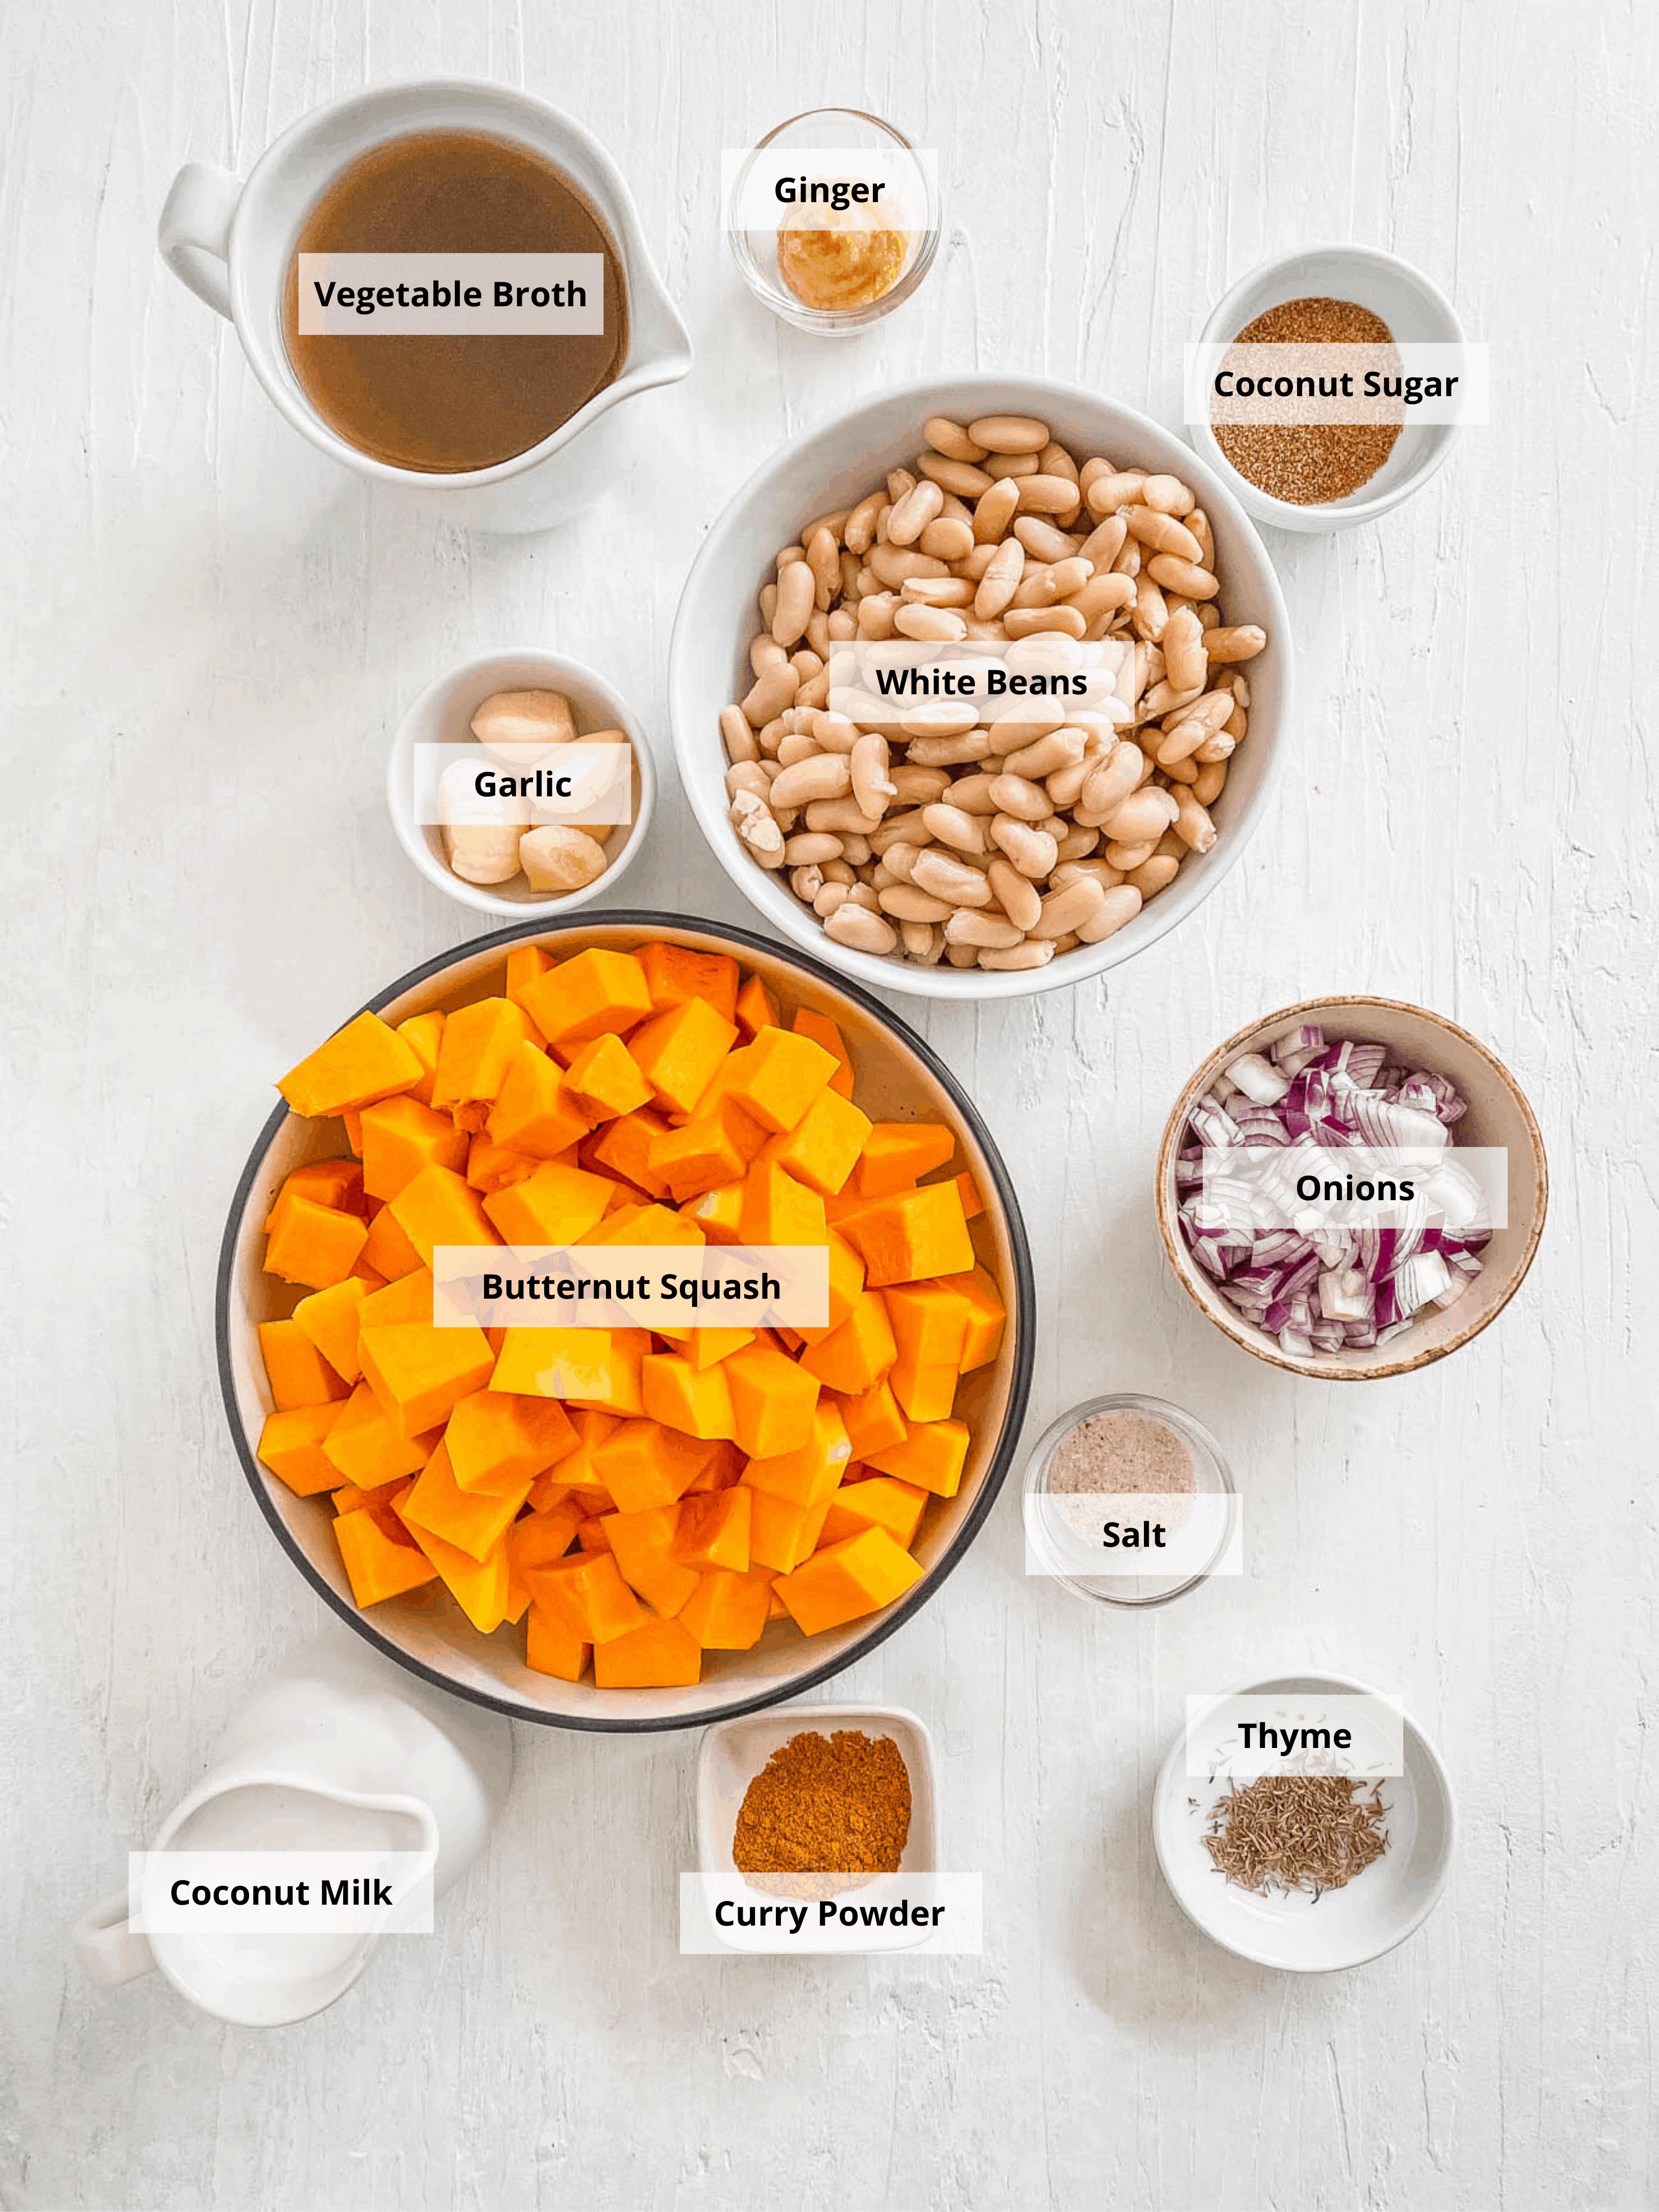 ingredients for vegan creamy butternut squash soup recipe